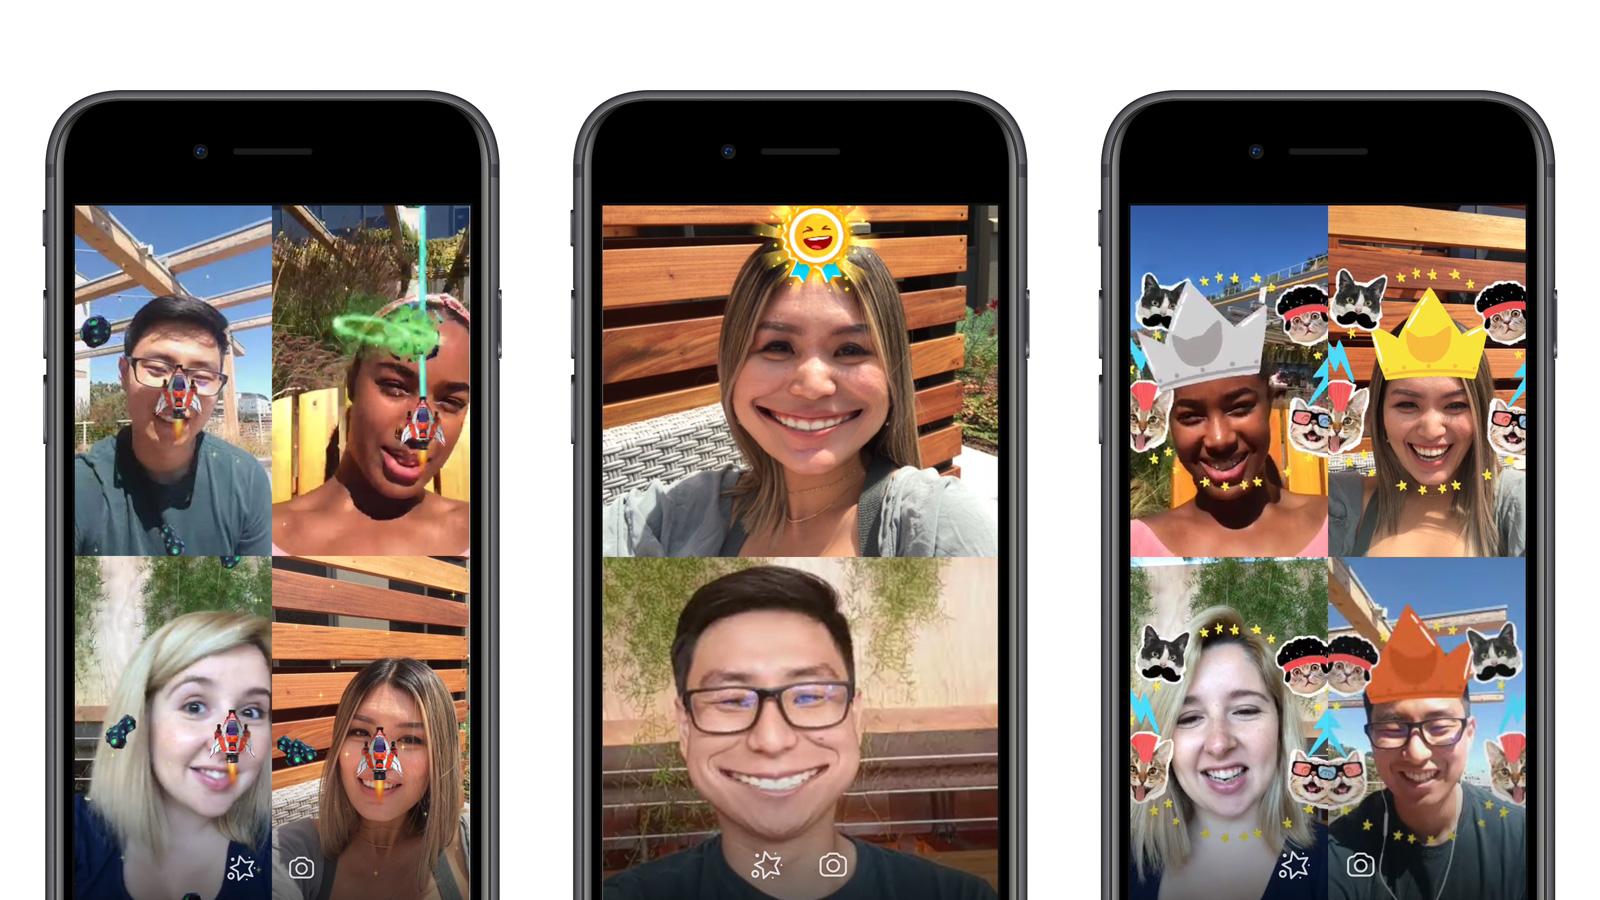 Resultado de imagem para facebook augmented reality games